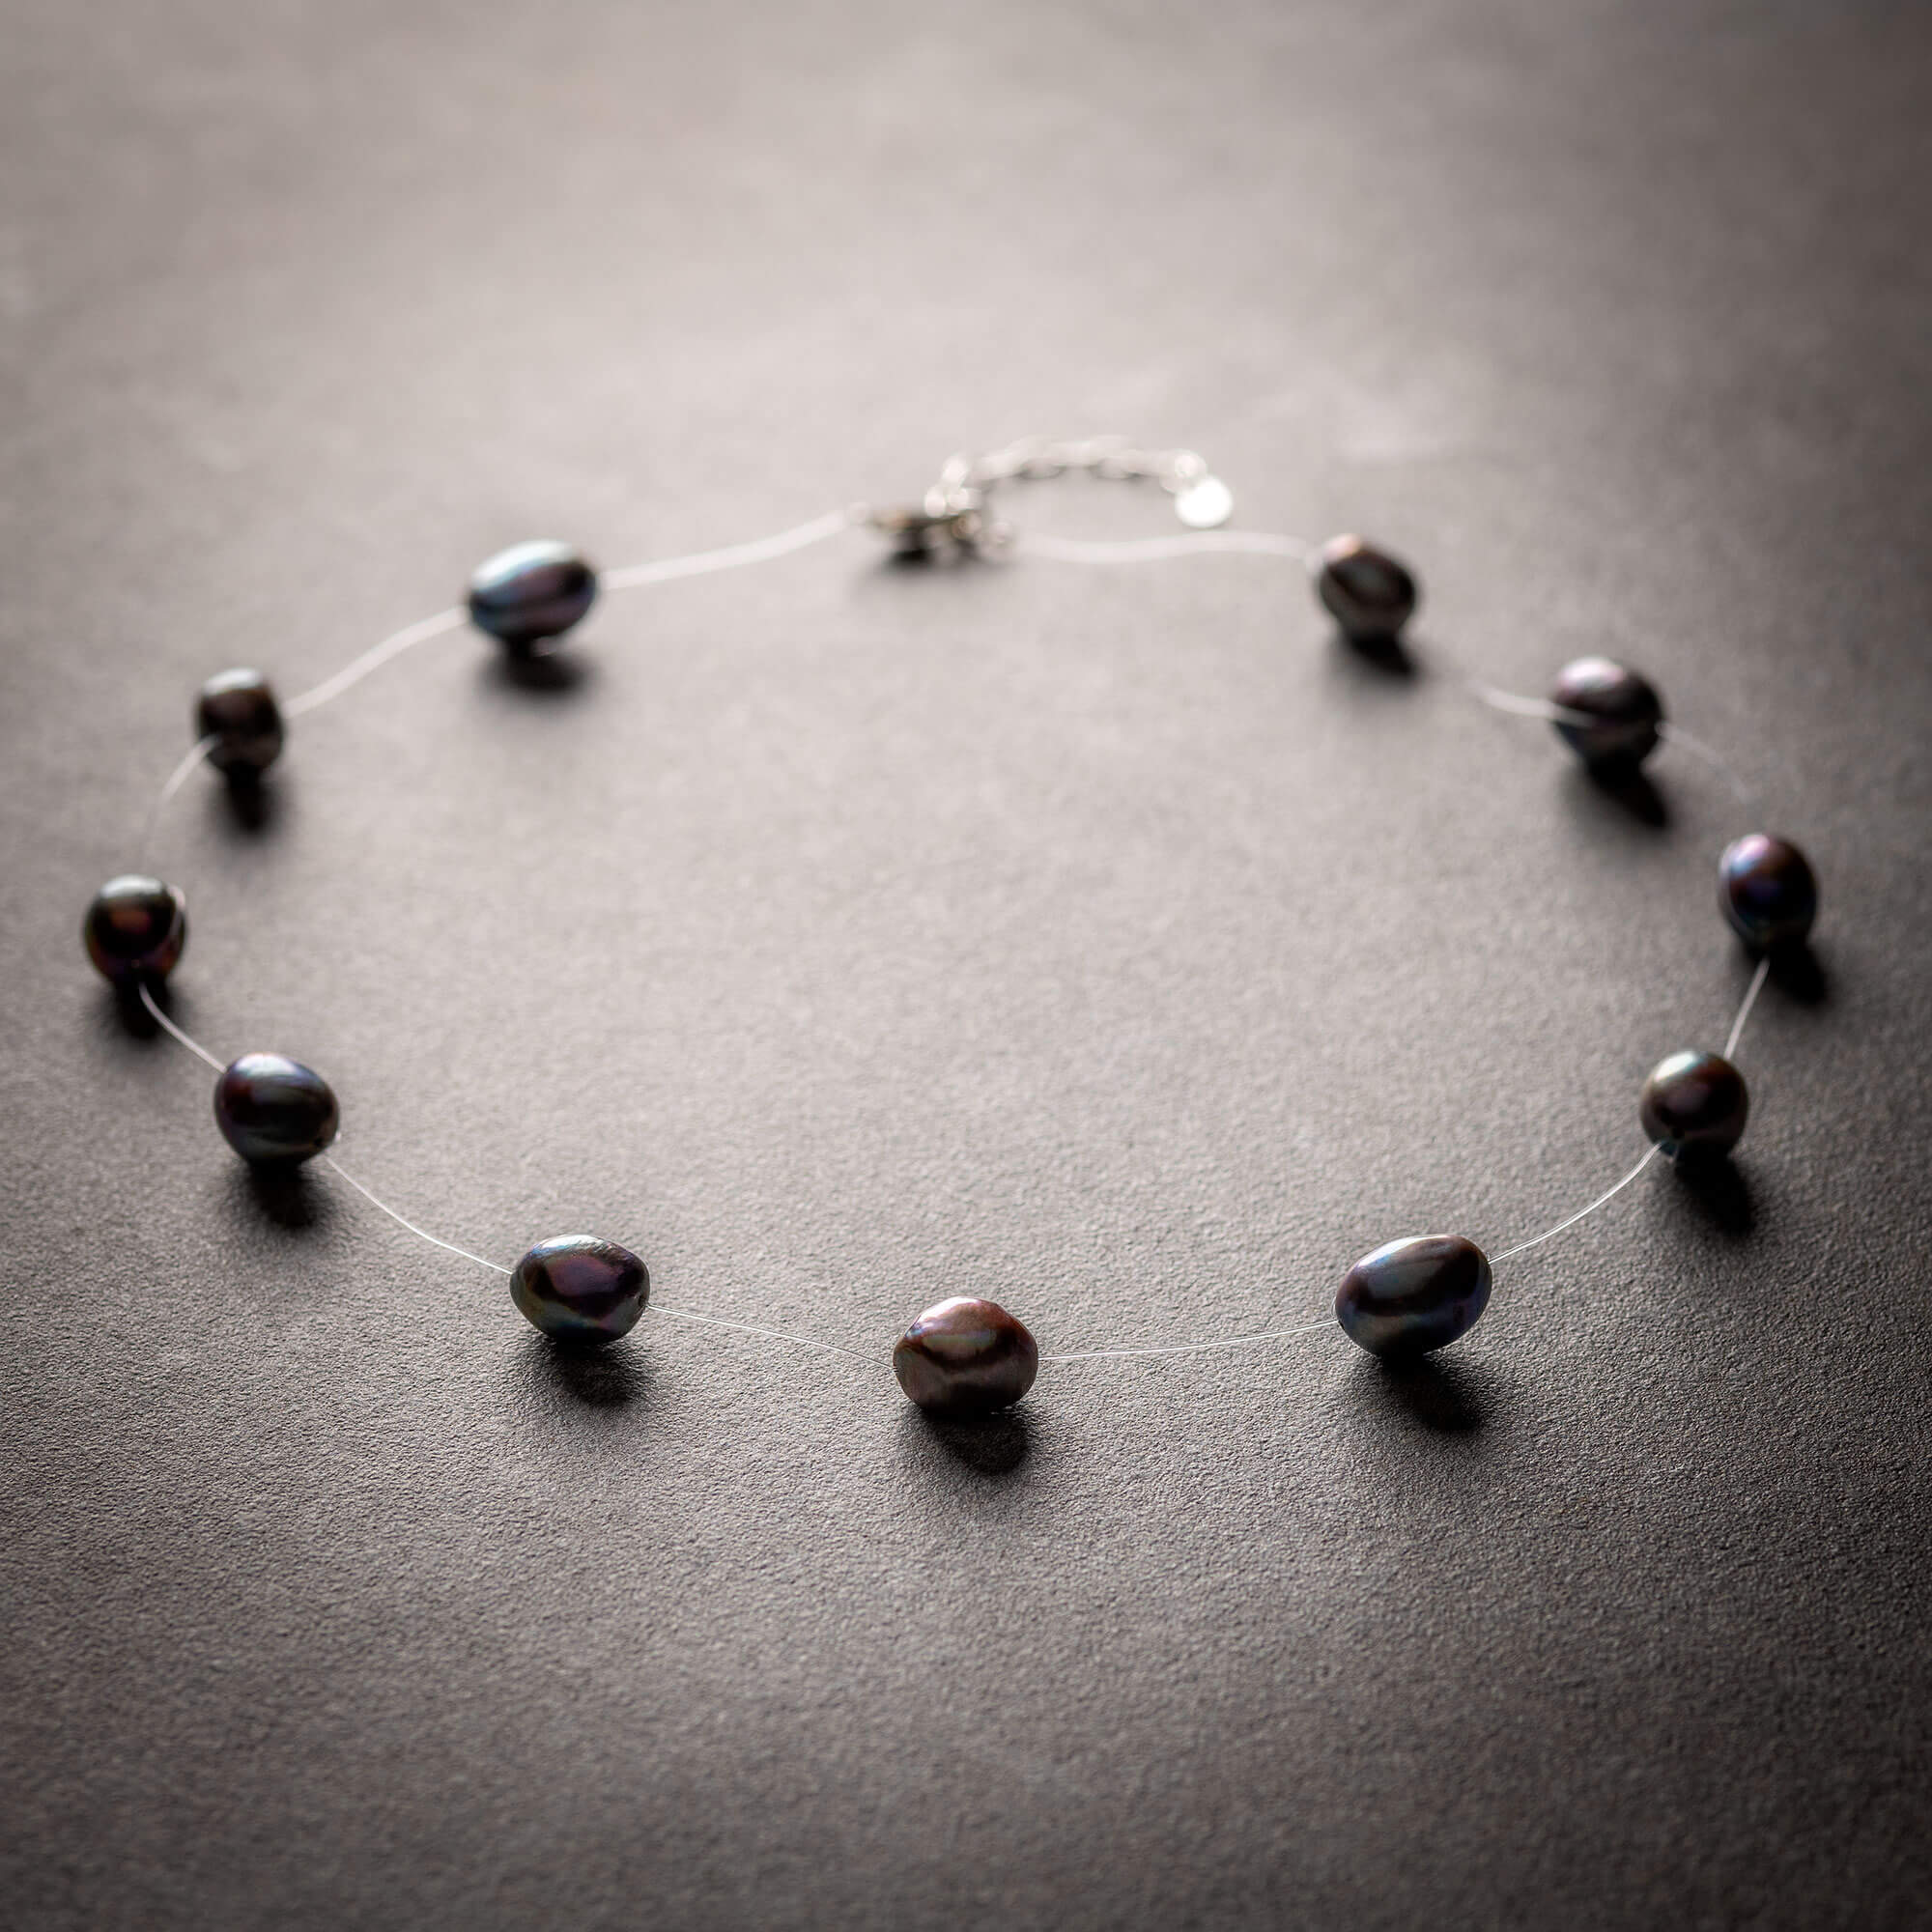 Large black floating pearl necklace